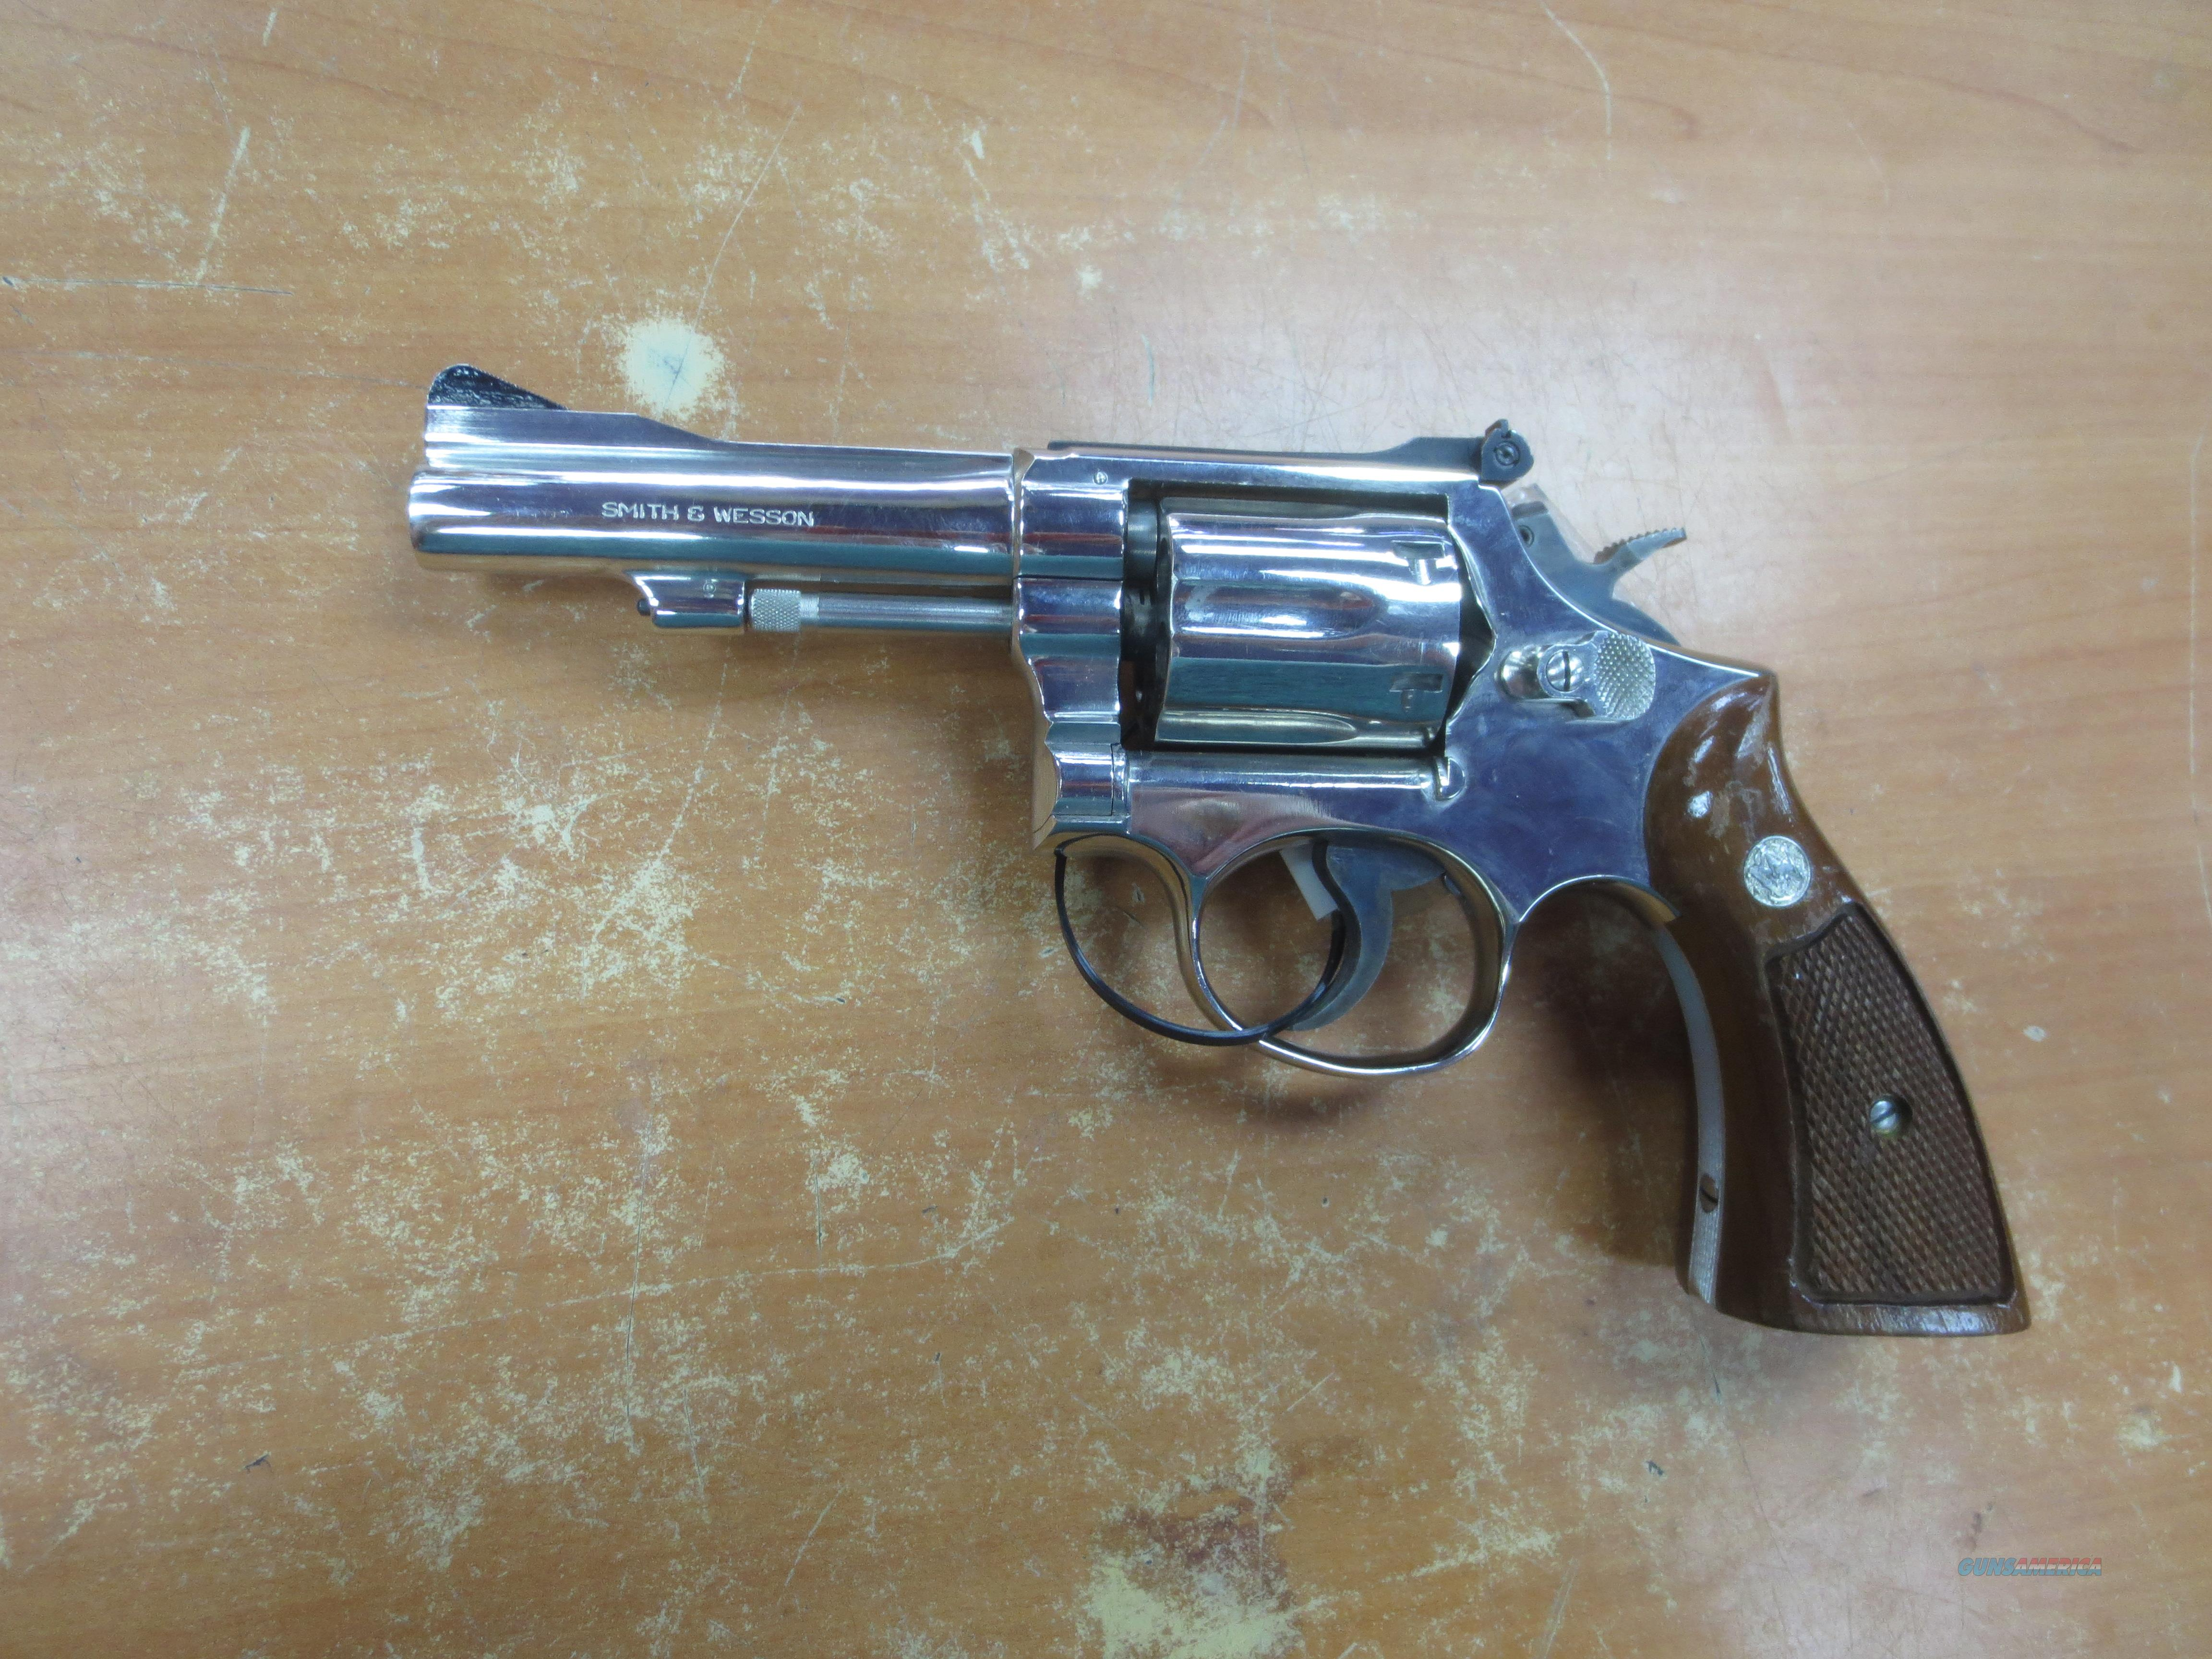 S&W mod# 15-3  Nickle Finish  .38 speciel  Guns > Pistols > Smith & Wesson Revolvers > Full Frame Revolver